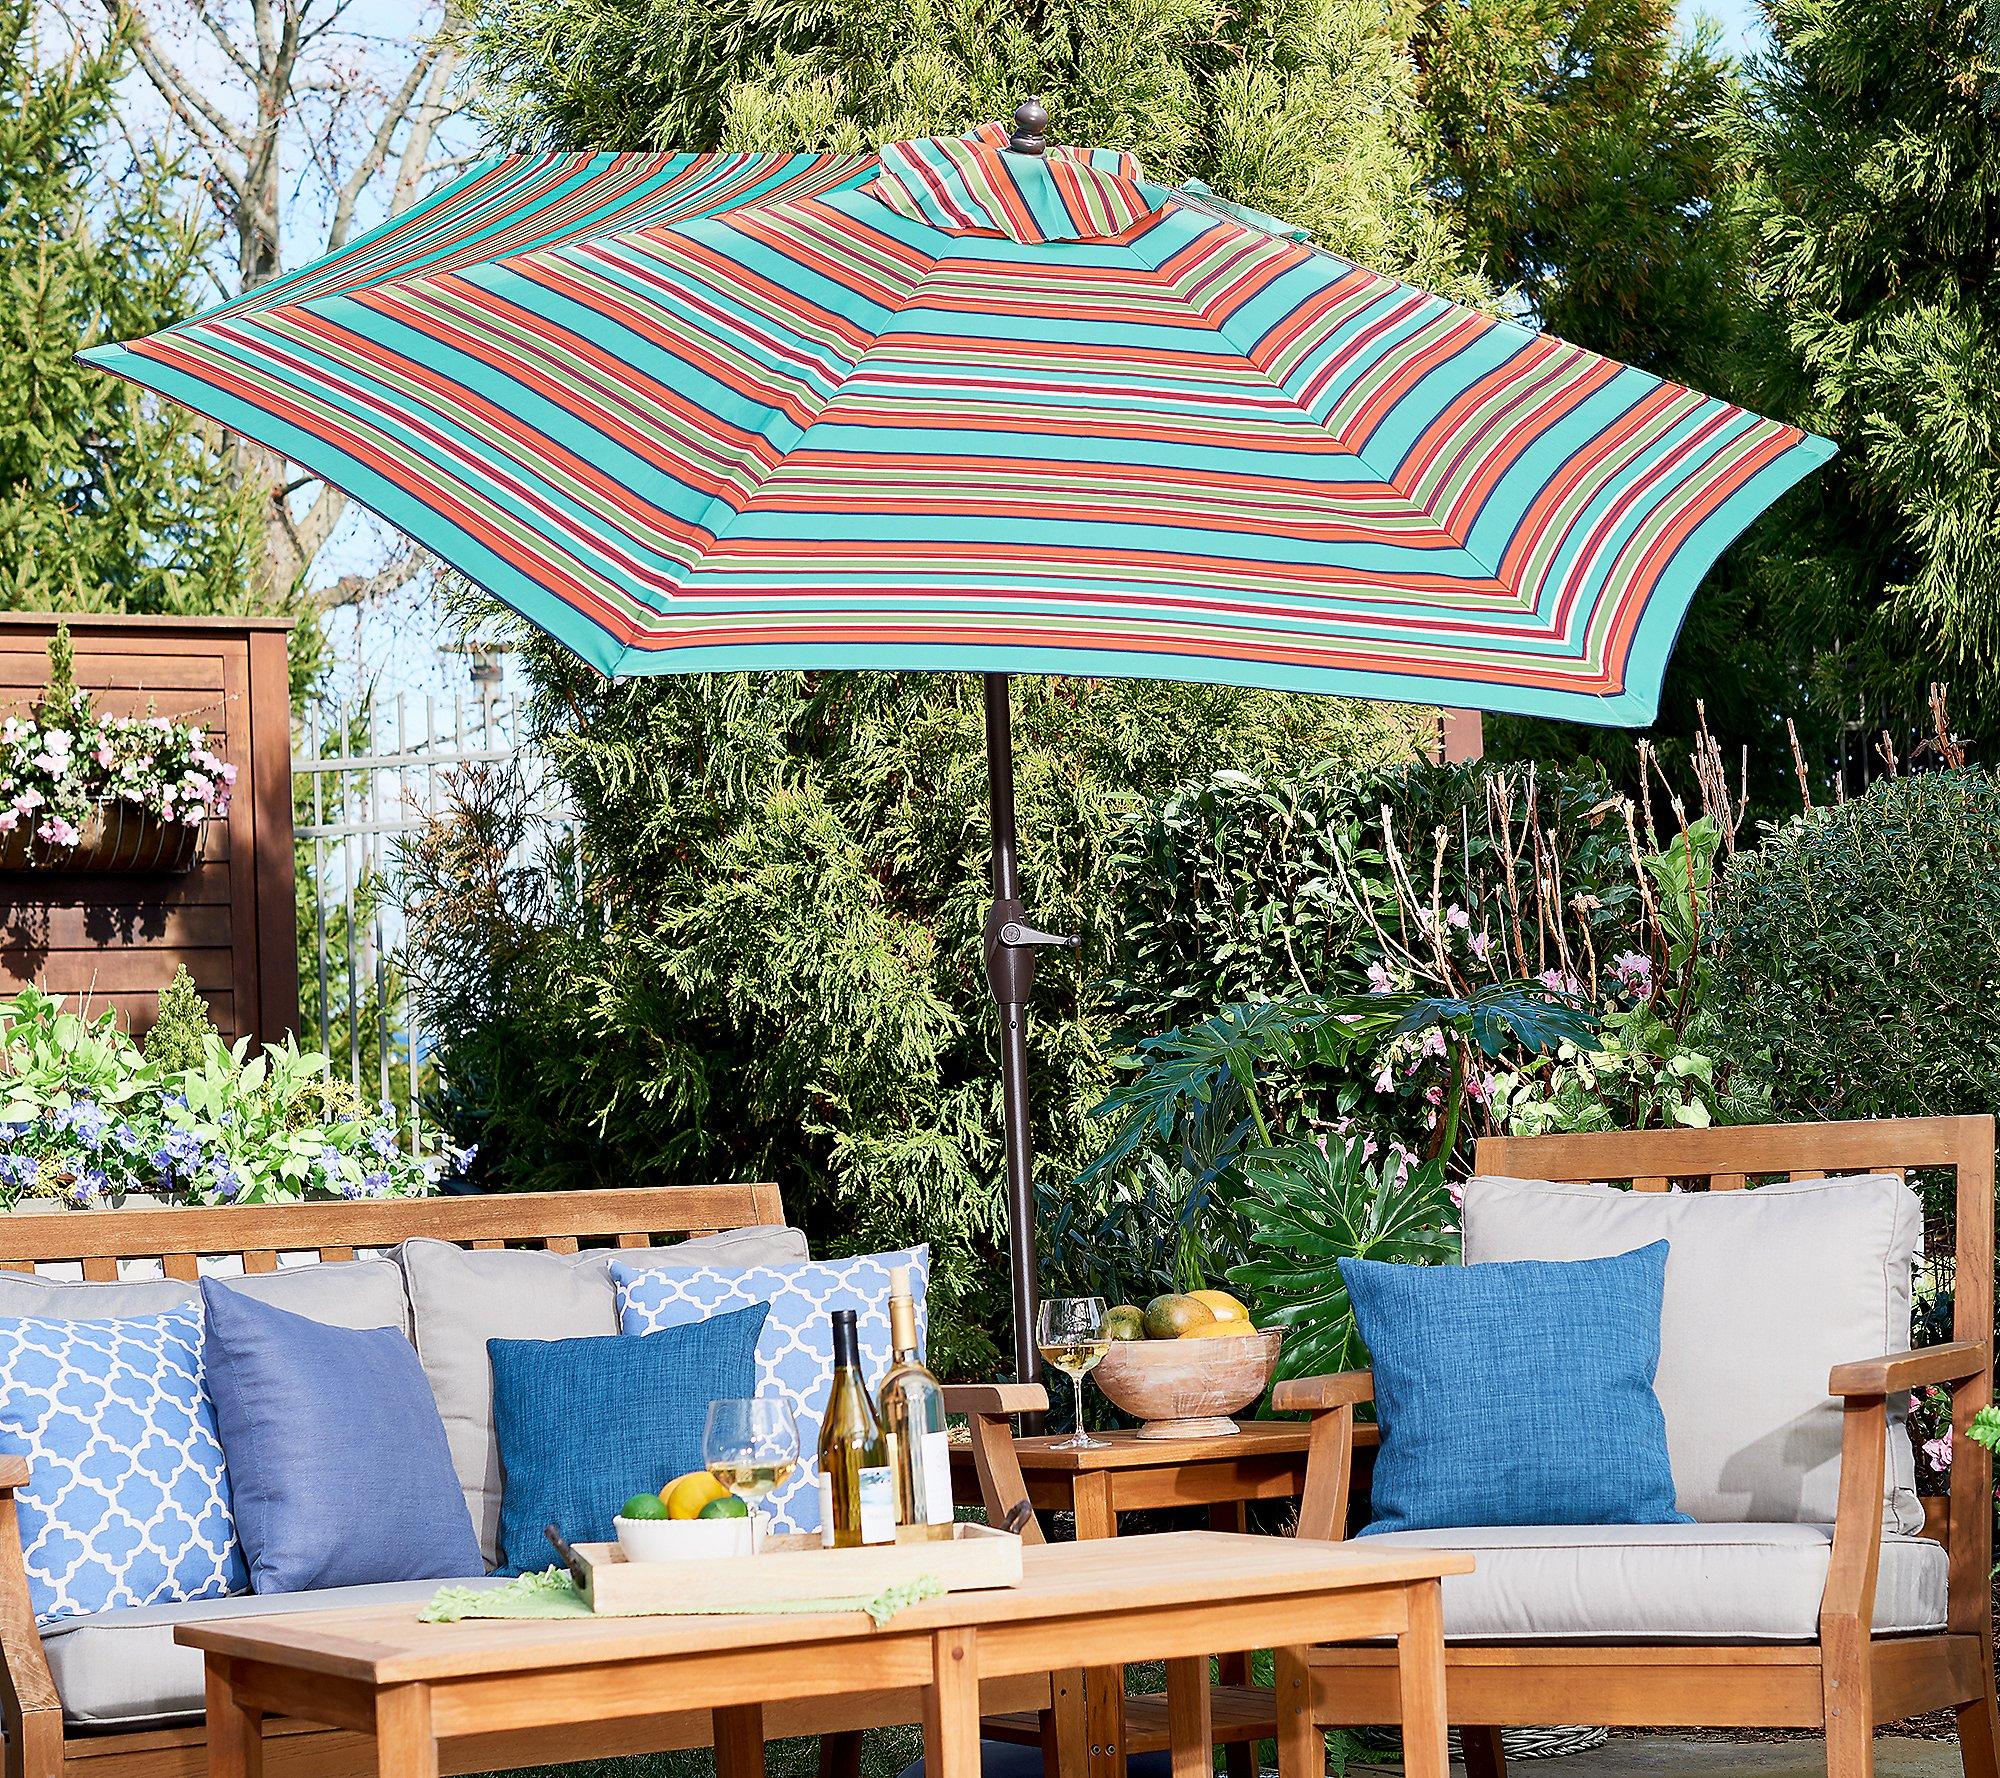 Garden Reflections 9 Round Patio Umbrella With Cover Qvc Com